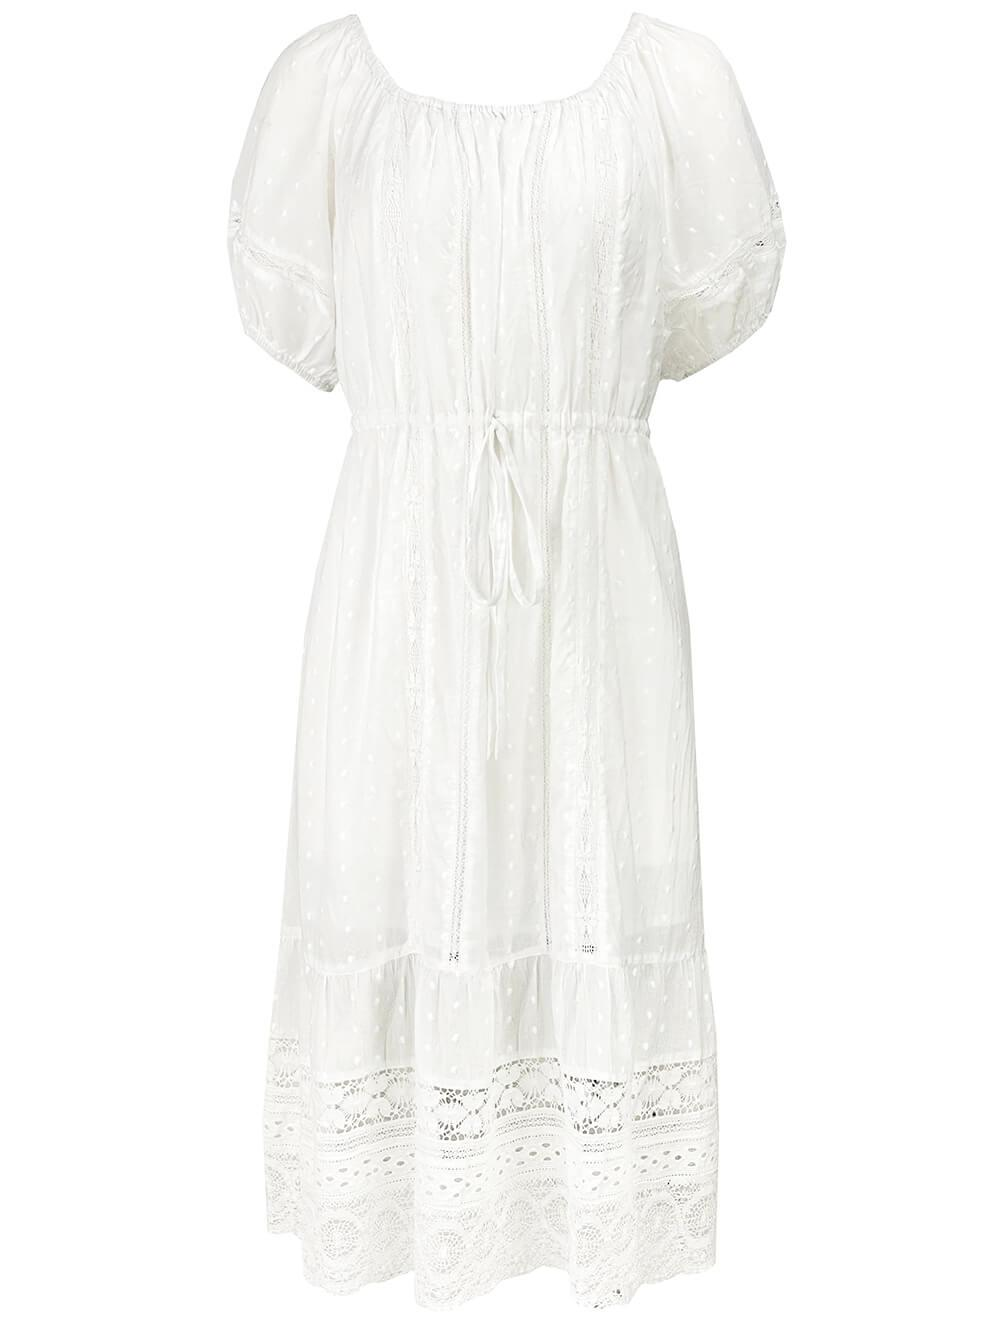 Adalyn Peasant Dress Item # ADALYN04